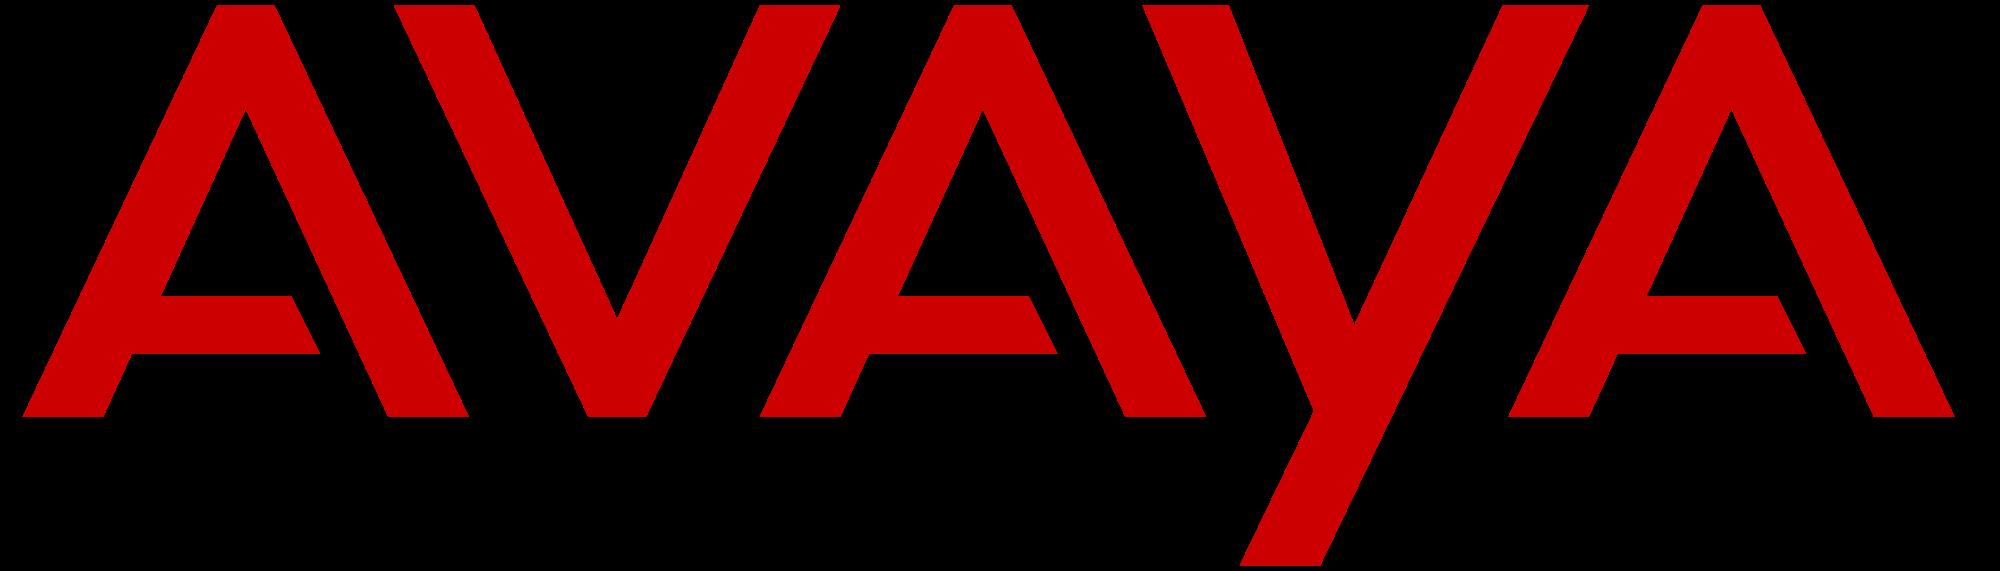 Avaya Unified Communications and Collaboration logo